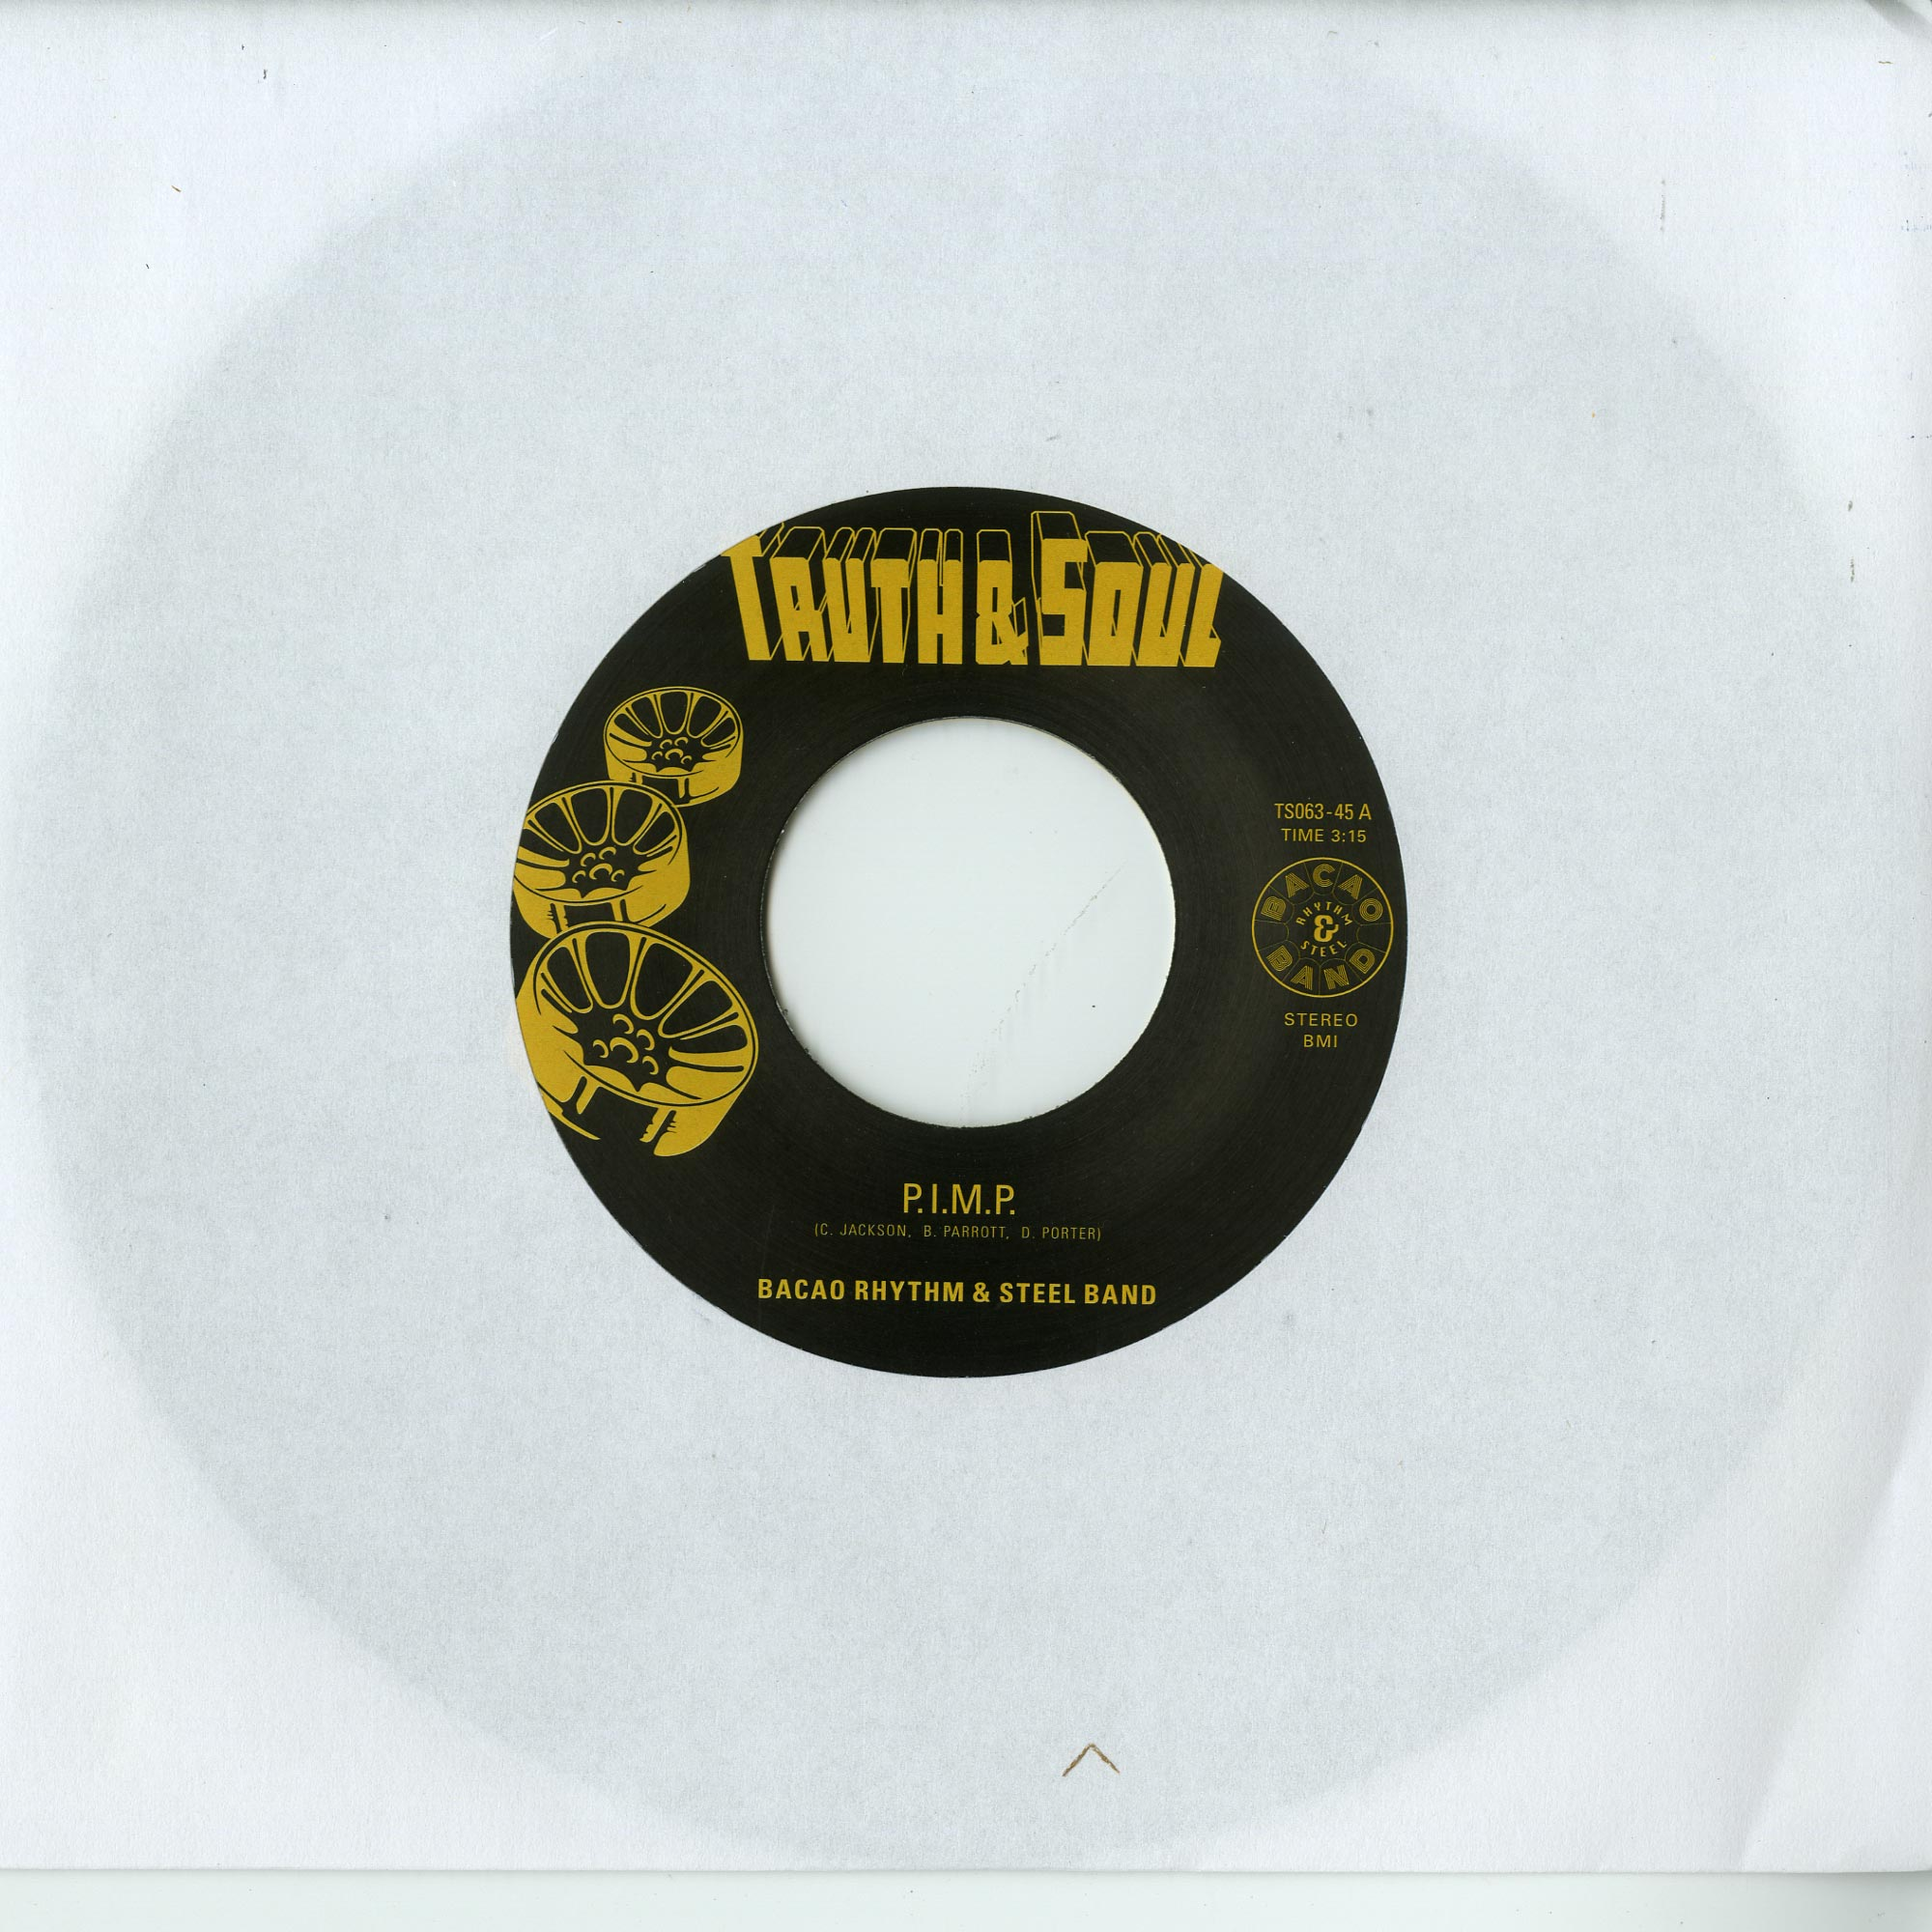 Bacao Rhythm & Steel Band - P.I.M.P.